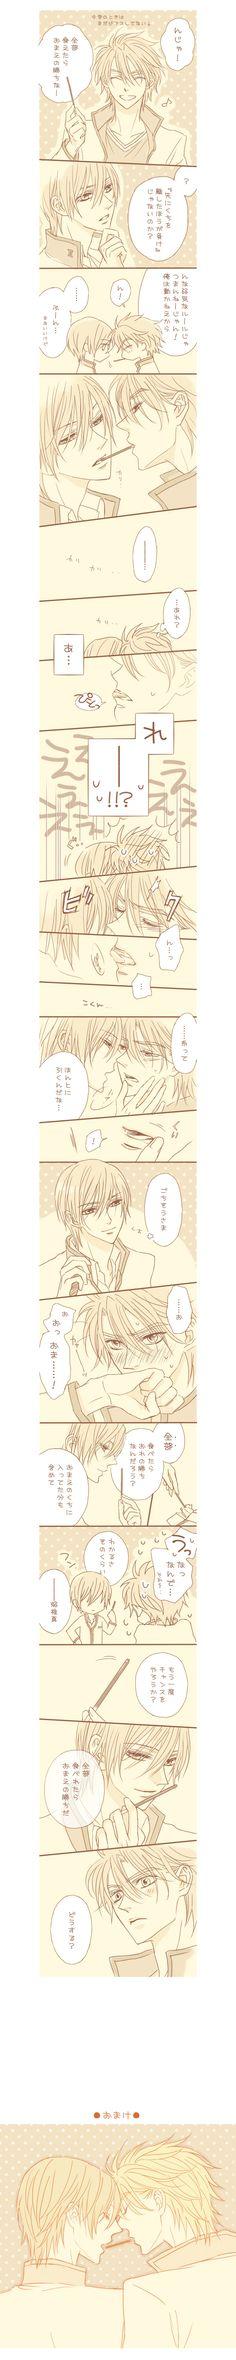 Pokey game ...  betrayal knows my name, hotsuma renjou, shūsei usui, uraboku, uragiri